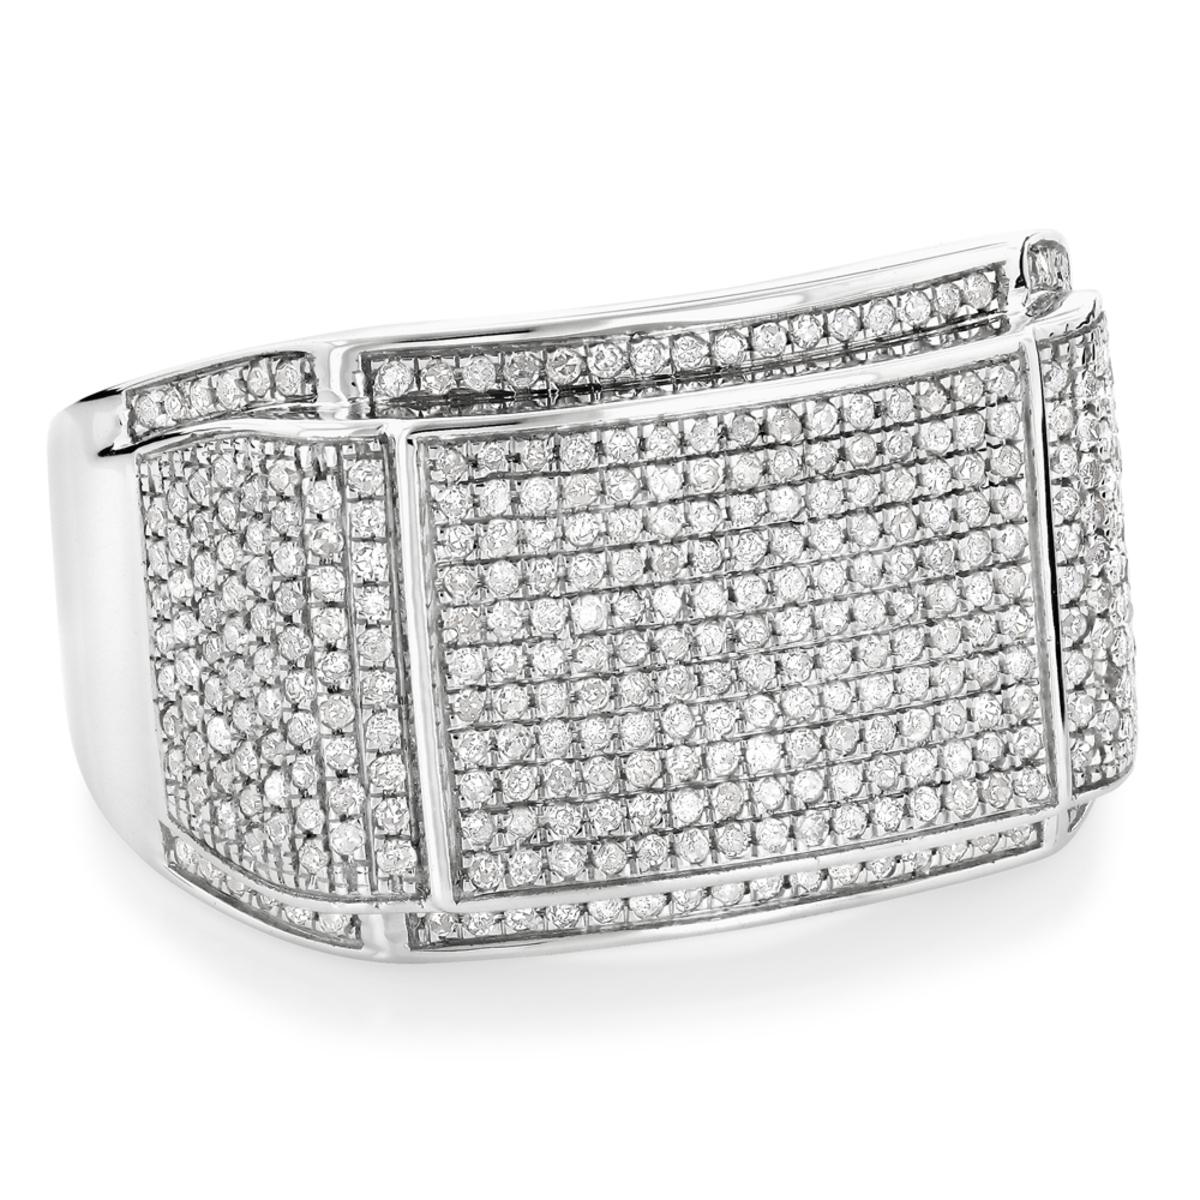 Mens Diamond Band 10K Gold Wedding Ring 0.8 carat